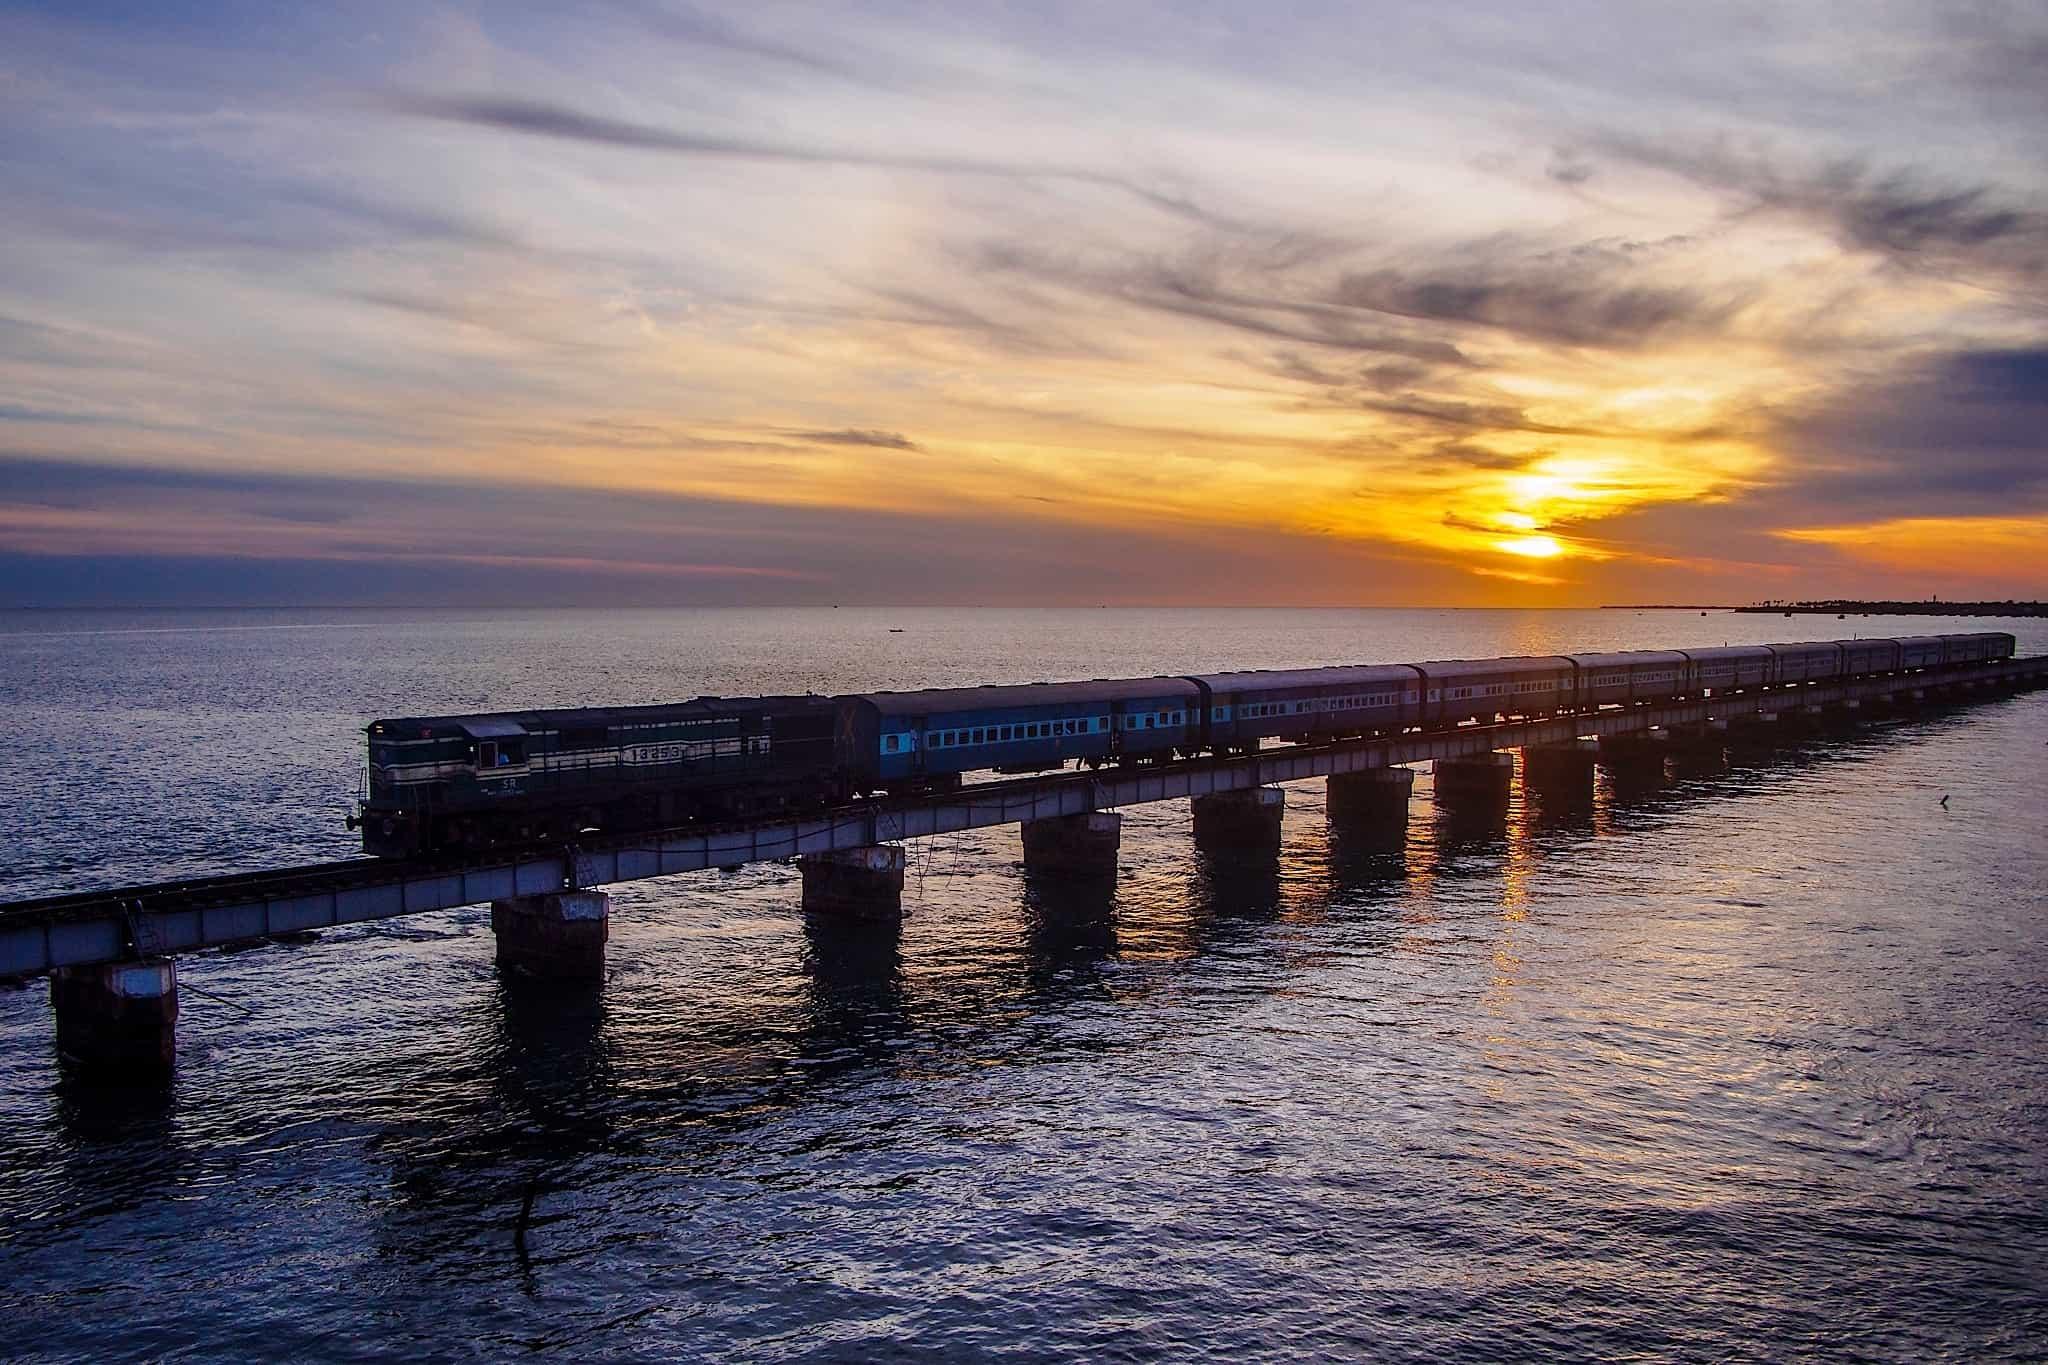 Sunrise from the Pamban Bridge